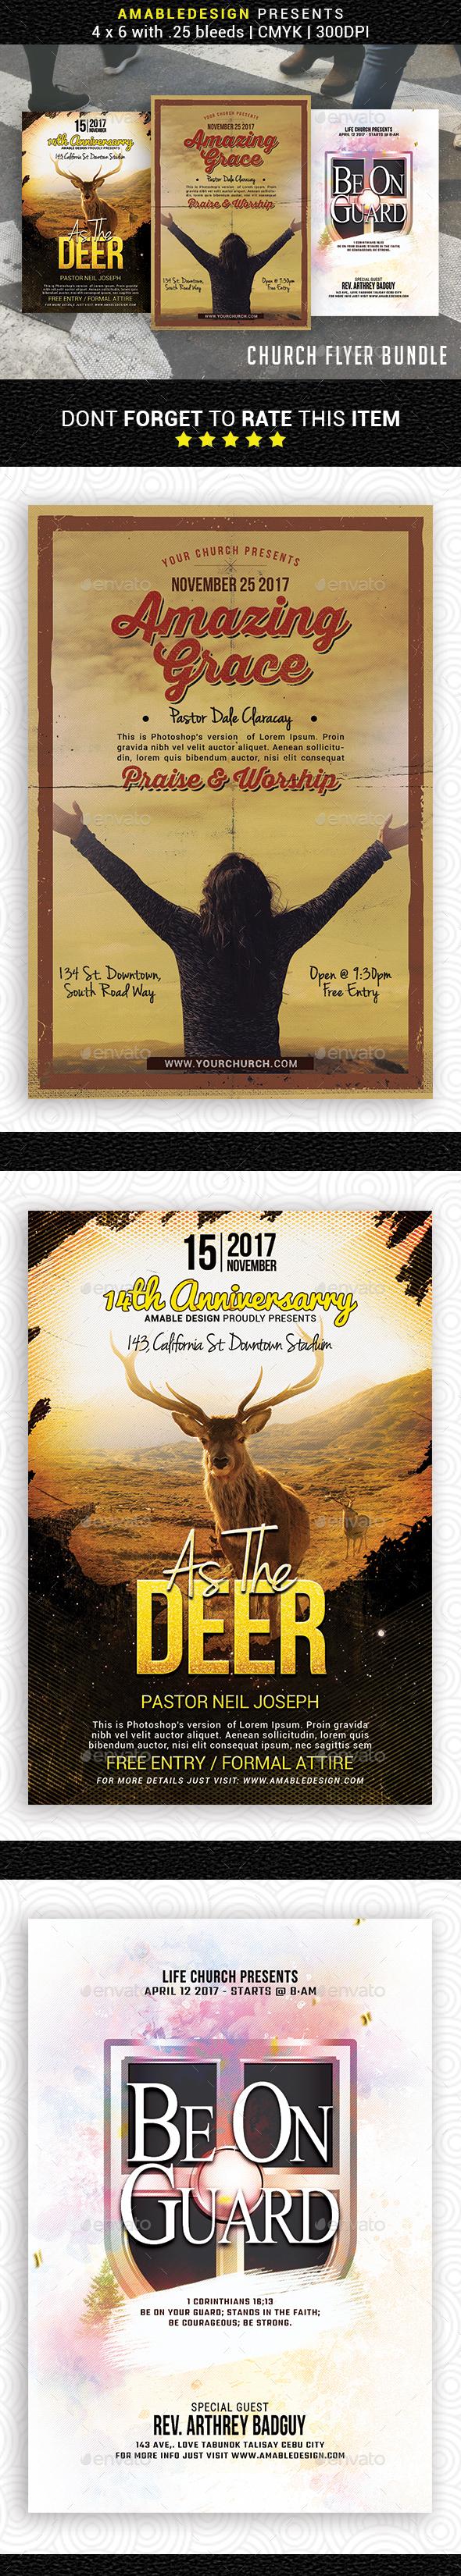 3 in 1 Worship Church Flyer/Poster Bundle - Church Flyers